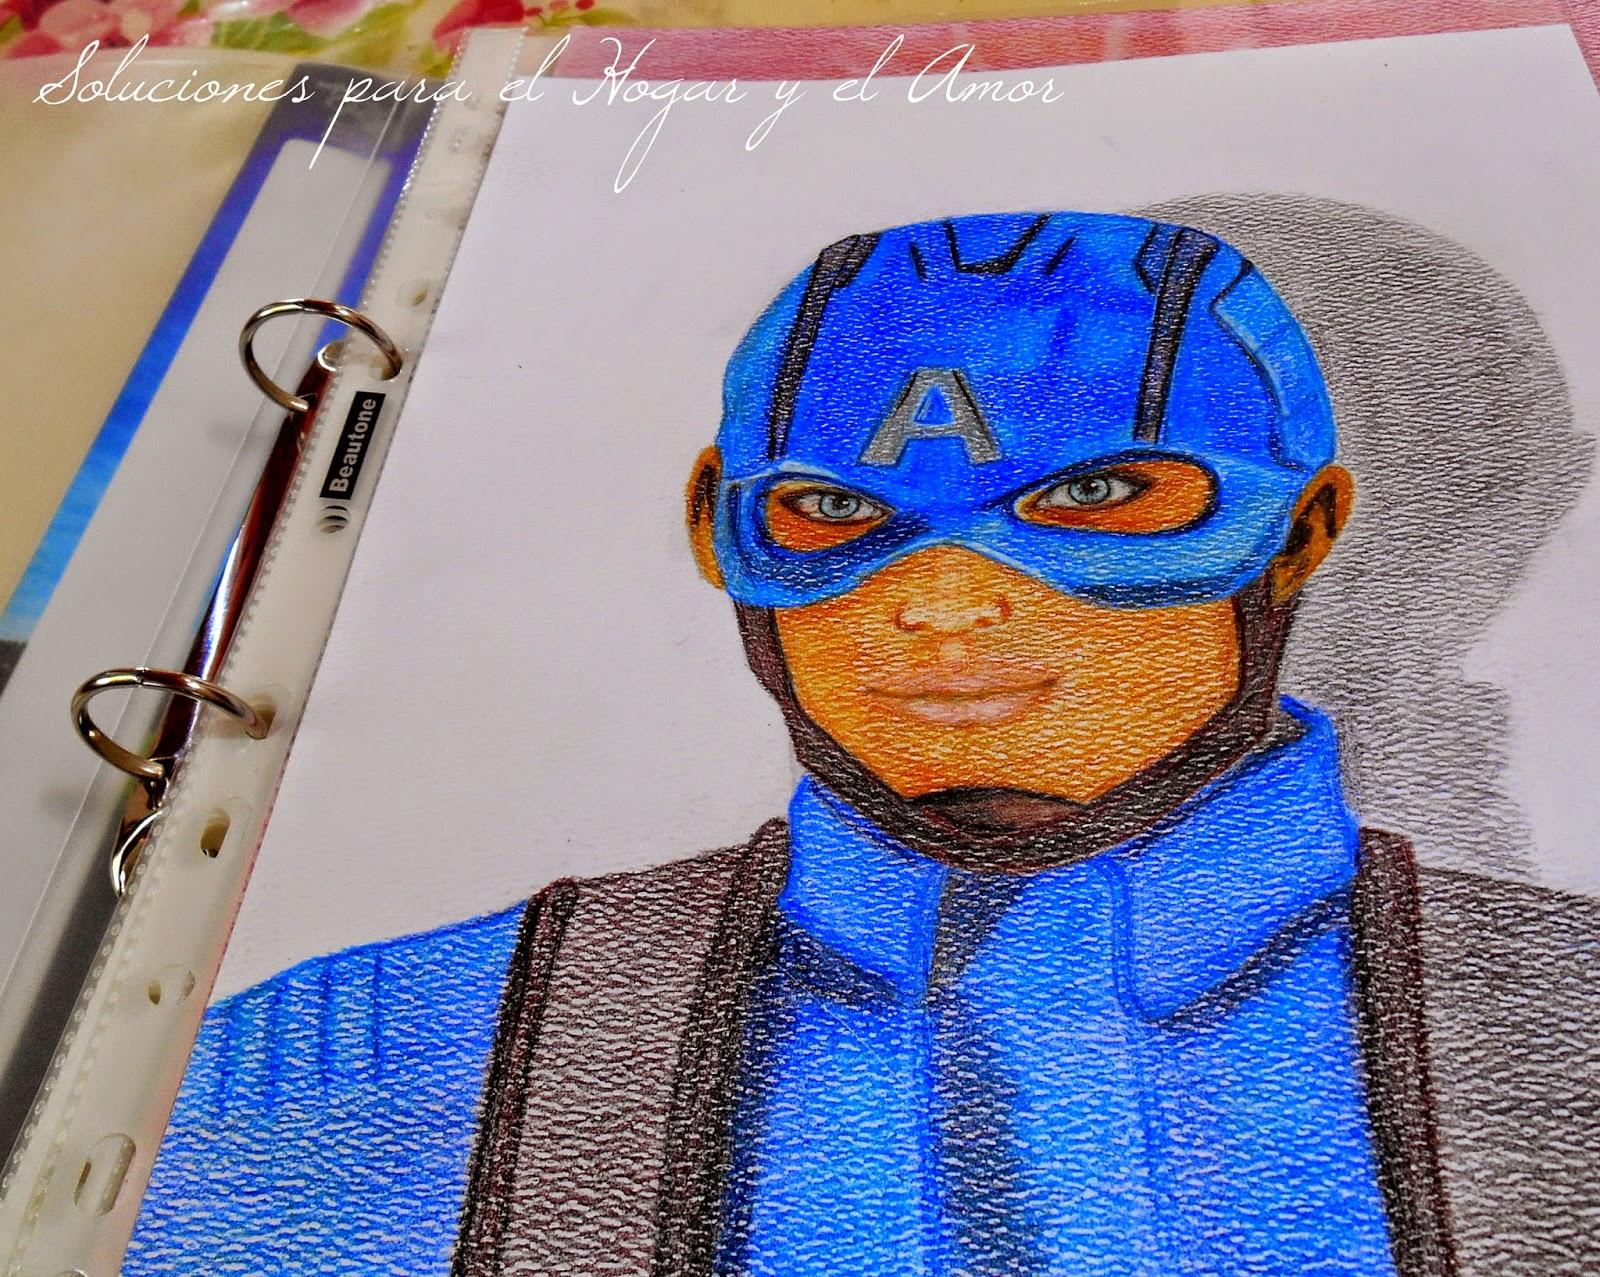 Mis Lápices y Dibujos, Capitan America, captain america